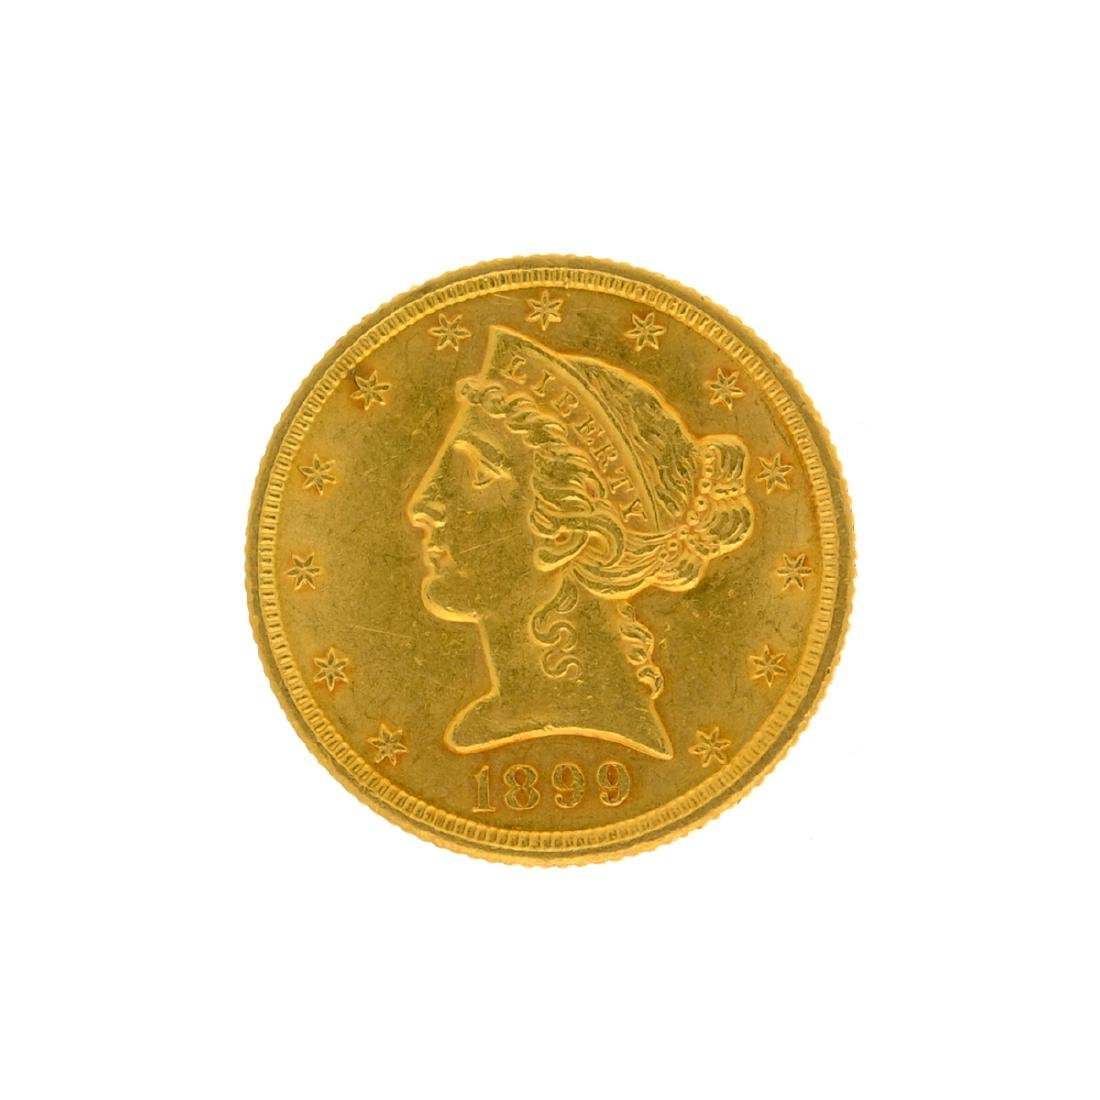 *1899 $5 Liberty Head Gold Coin (DF)